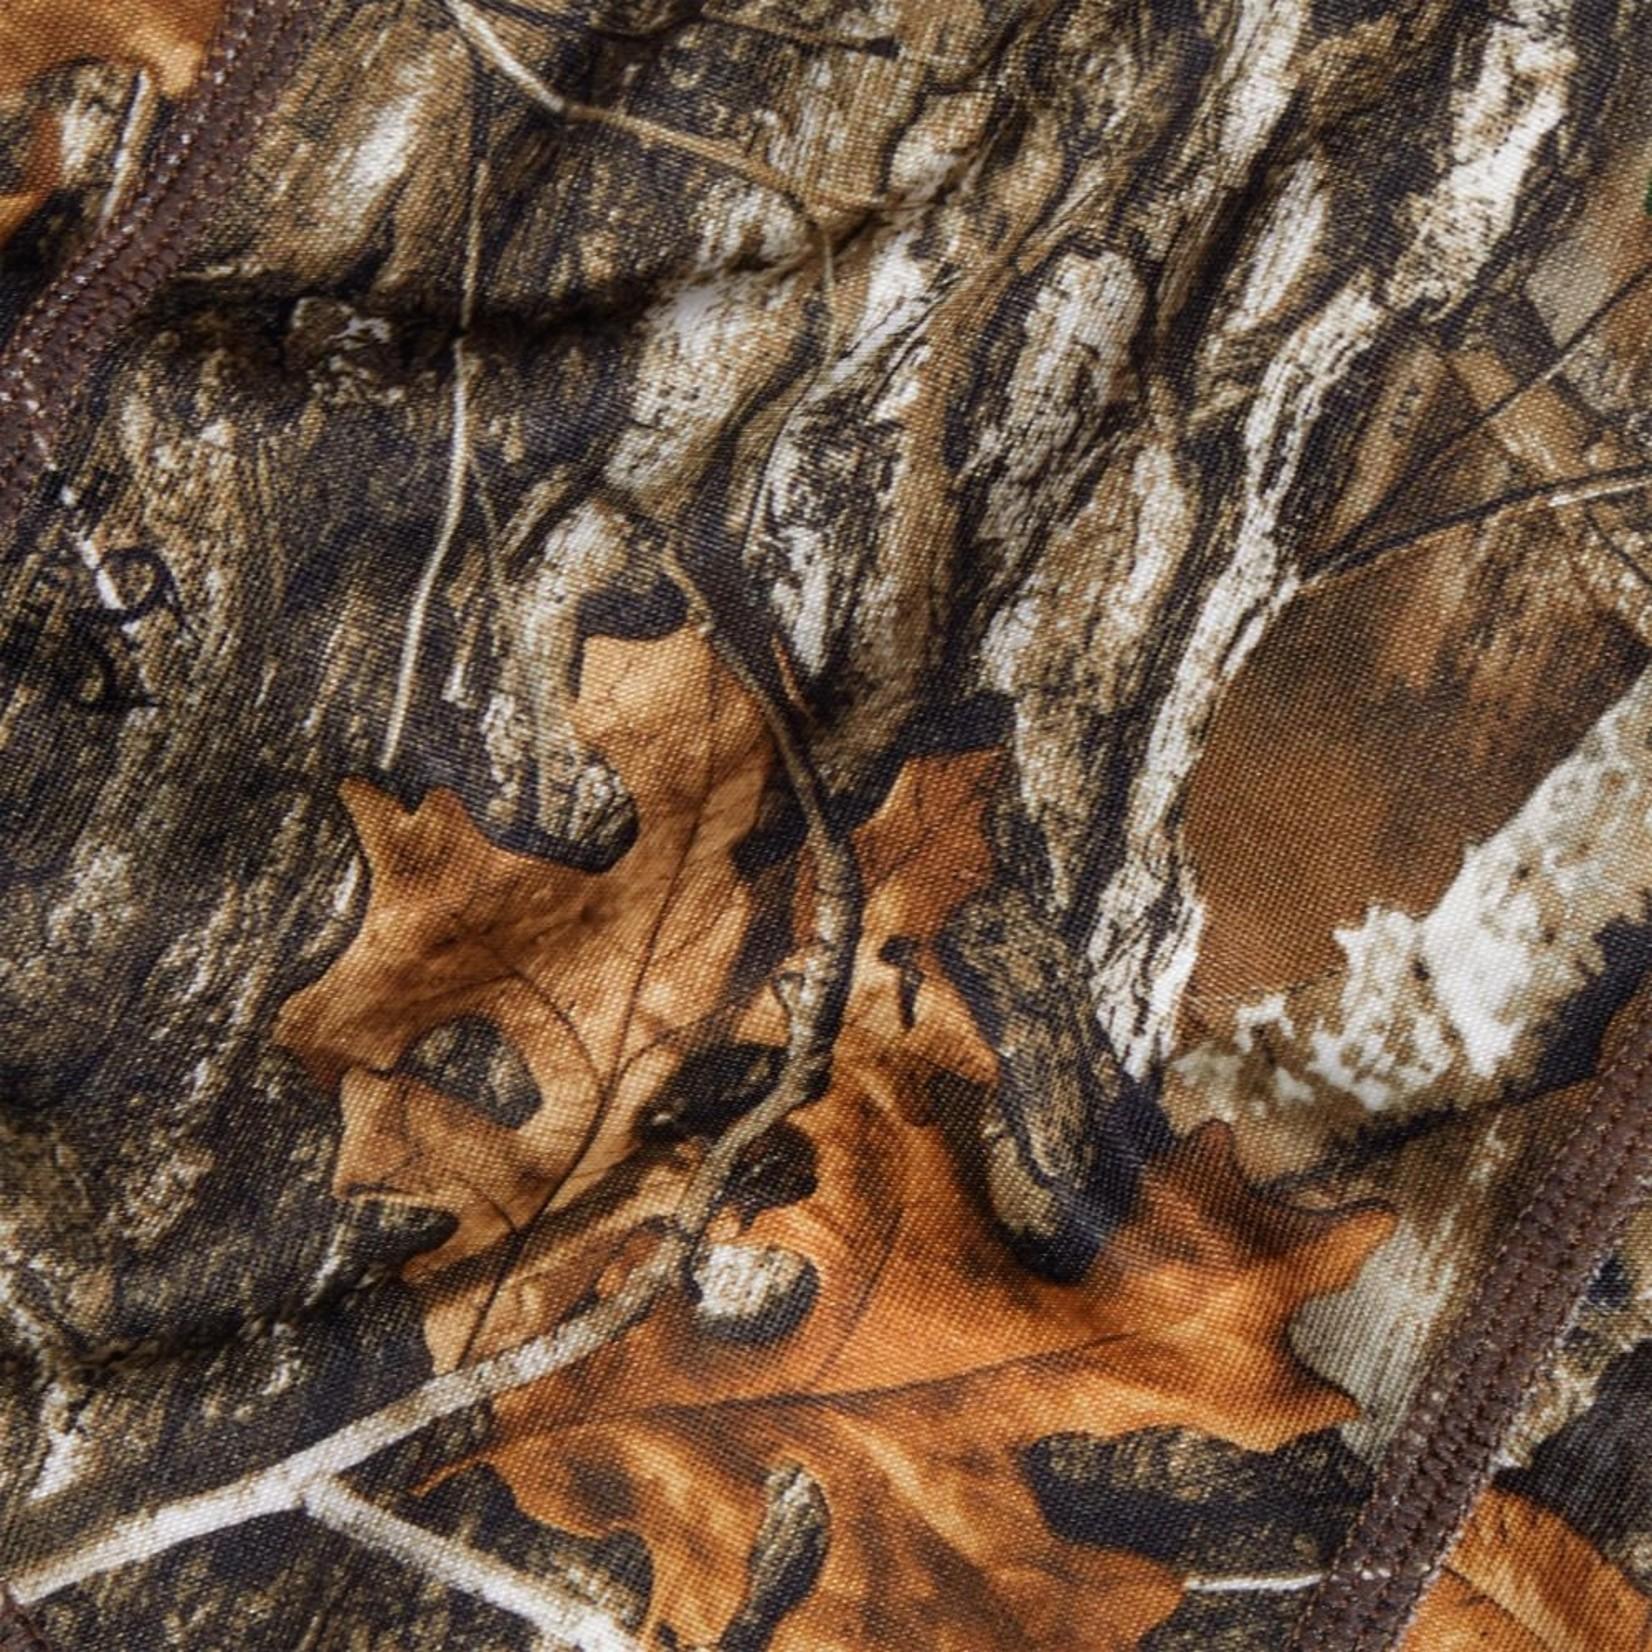 Allen Masque Pour Le Visage Vanish Camo Balaclava - Real Tree Edge